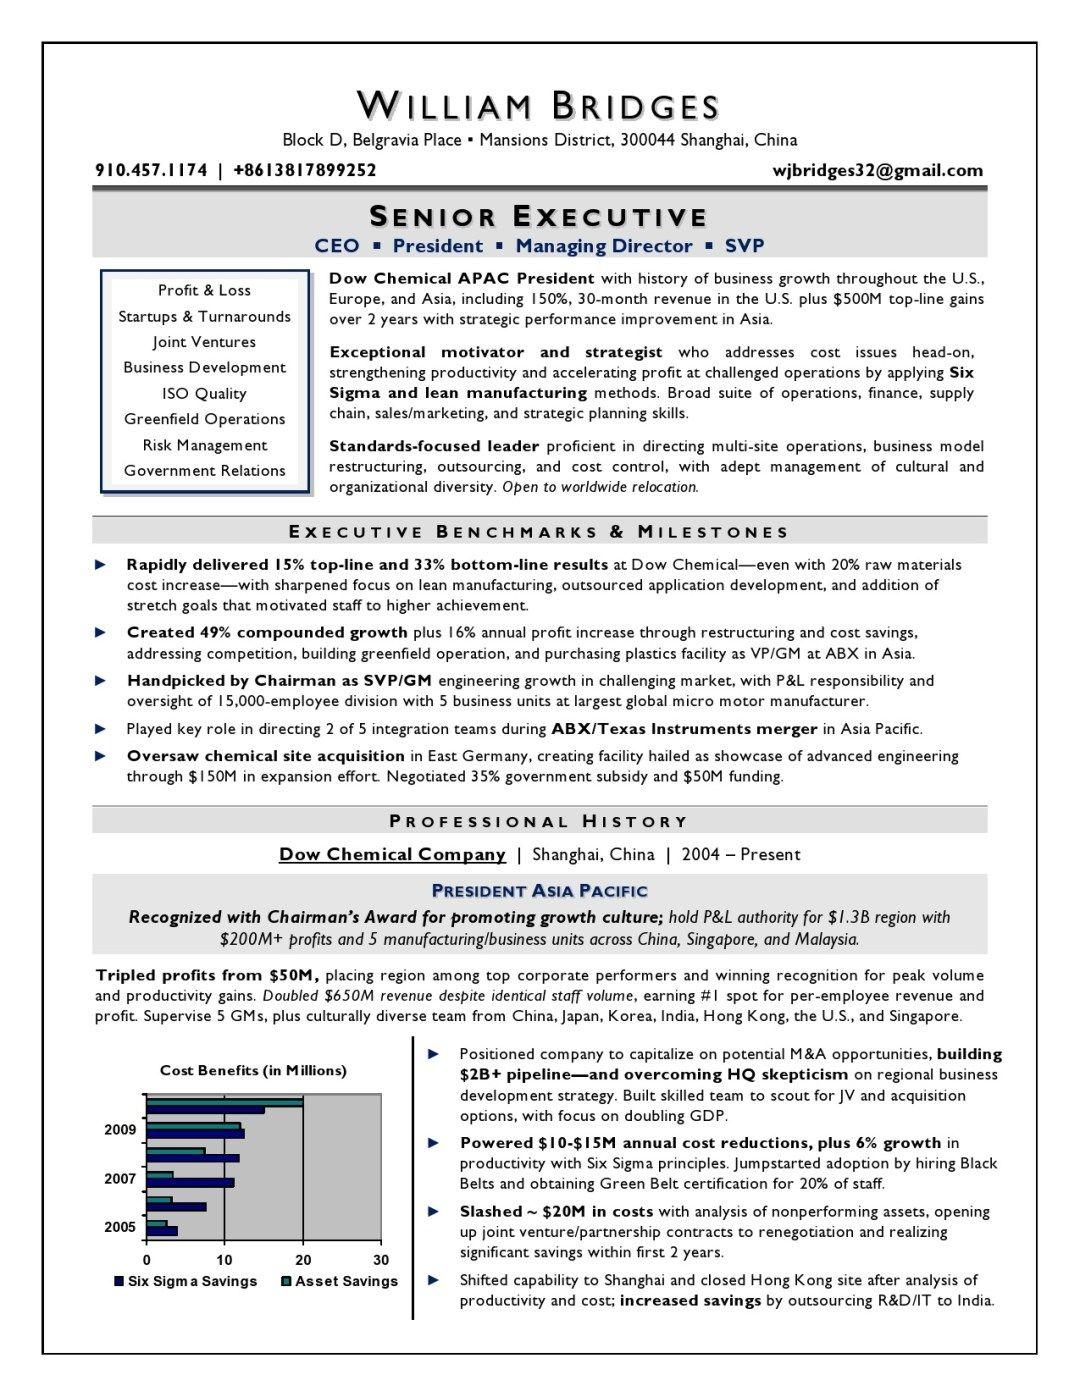 Global International Ceo Resume Sample Page 1 Resume Writer Executive Resume Resume Examples